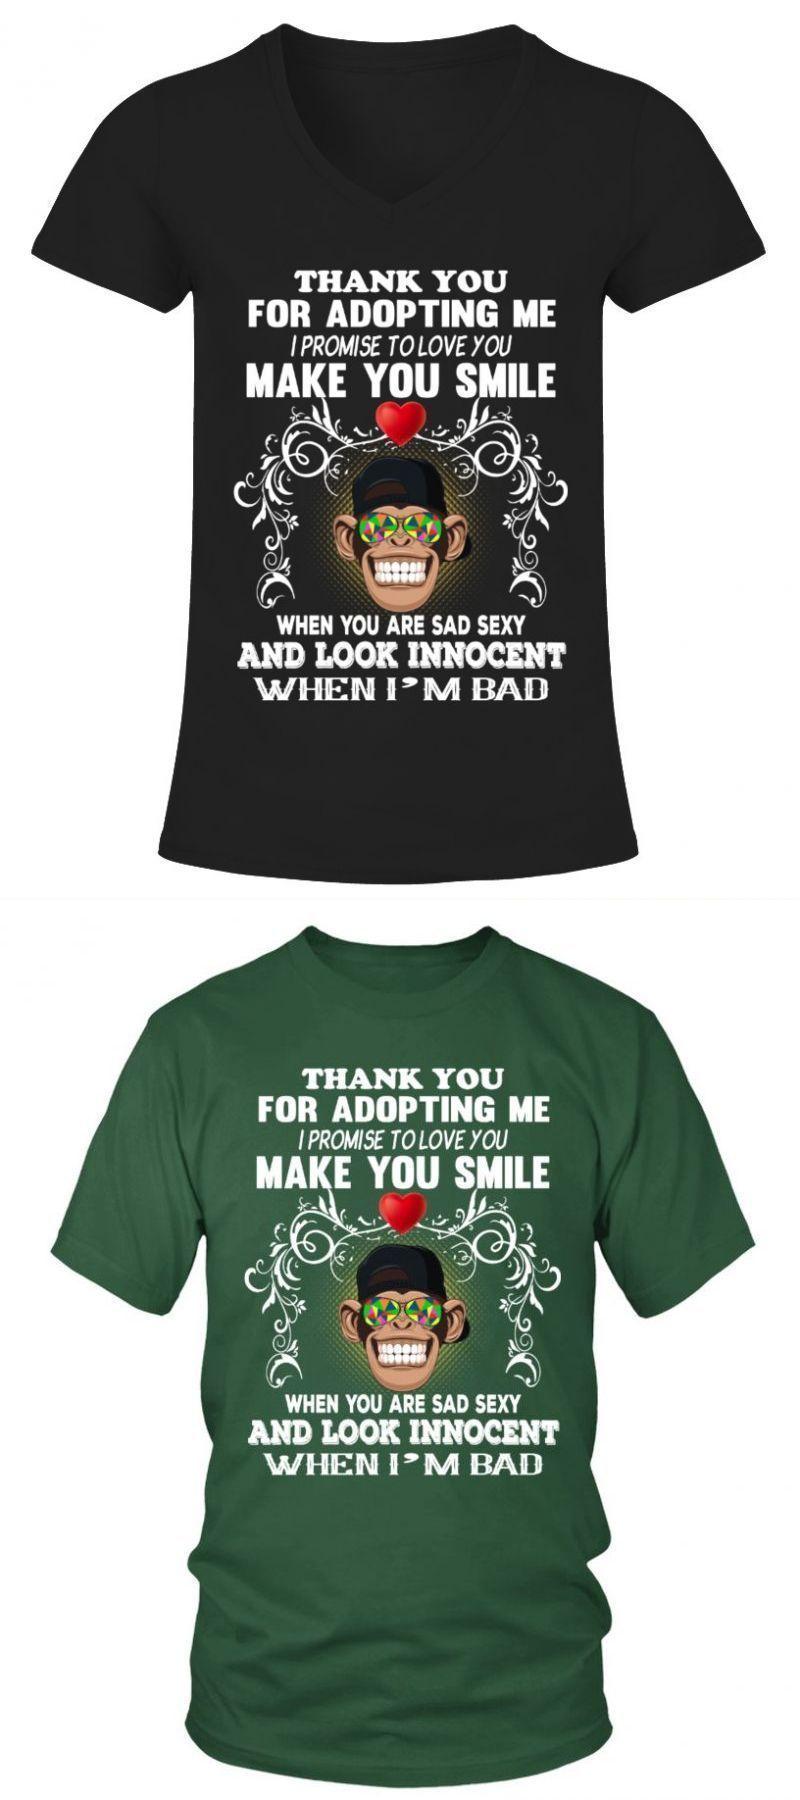 Gas monkey garage t shirt monkey make you smile monkey d luffy t shirt #gasmonkeygarage Gas monkey garage t shirt monkey make you smile monkey d luffy t shirt #gas #monkey #garage #shirt #make #you #smile #luffy #brass #v-neck #t-shirt #woman #round #neck #unisex #gasmonkeygarage Gas monkey garage t shirt monkey make you smile monkey d luffy t shirt #gasmonkeygarage Gas monkey garage t shirt monkey make you smile monkey d luffy t shirt #gas #monkey #garage #shirt #make #you #smile #luffy #brass #gasmonkeygarage